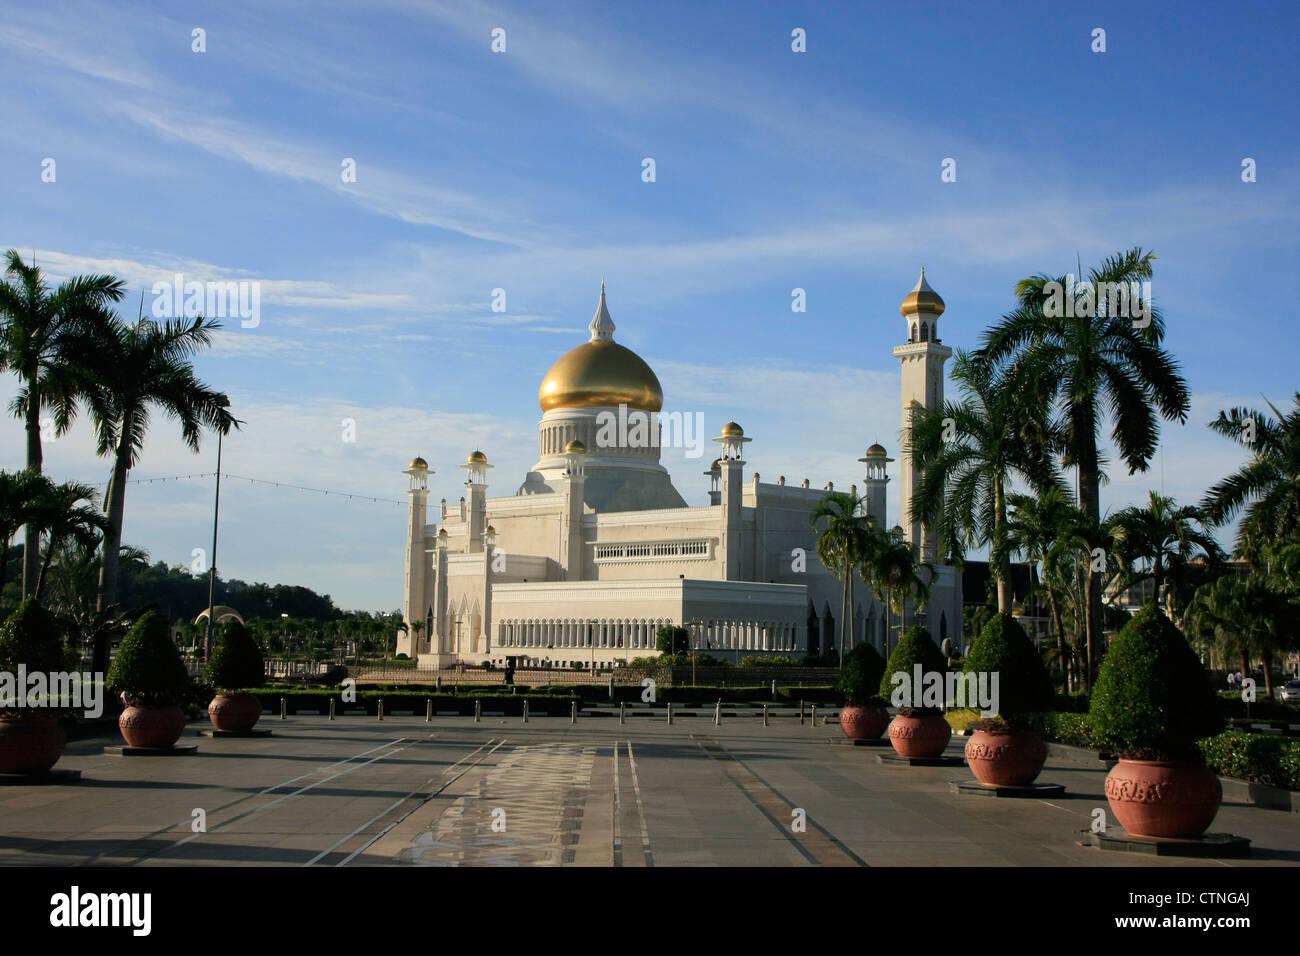 Sultan Omar Ali Saifudding Mosque, Bandar Seri Begawan, Brunei, Southeast Asia - Stock Image